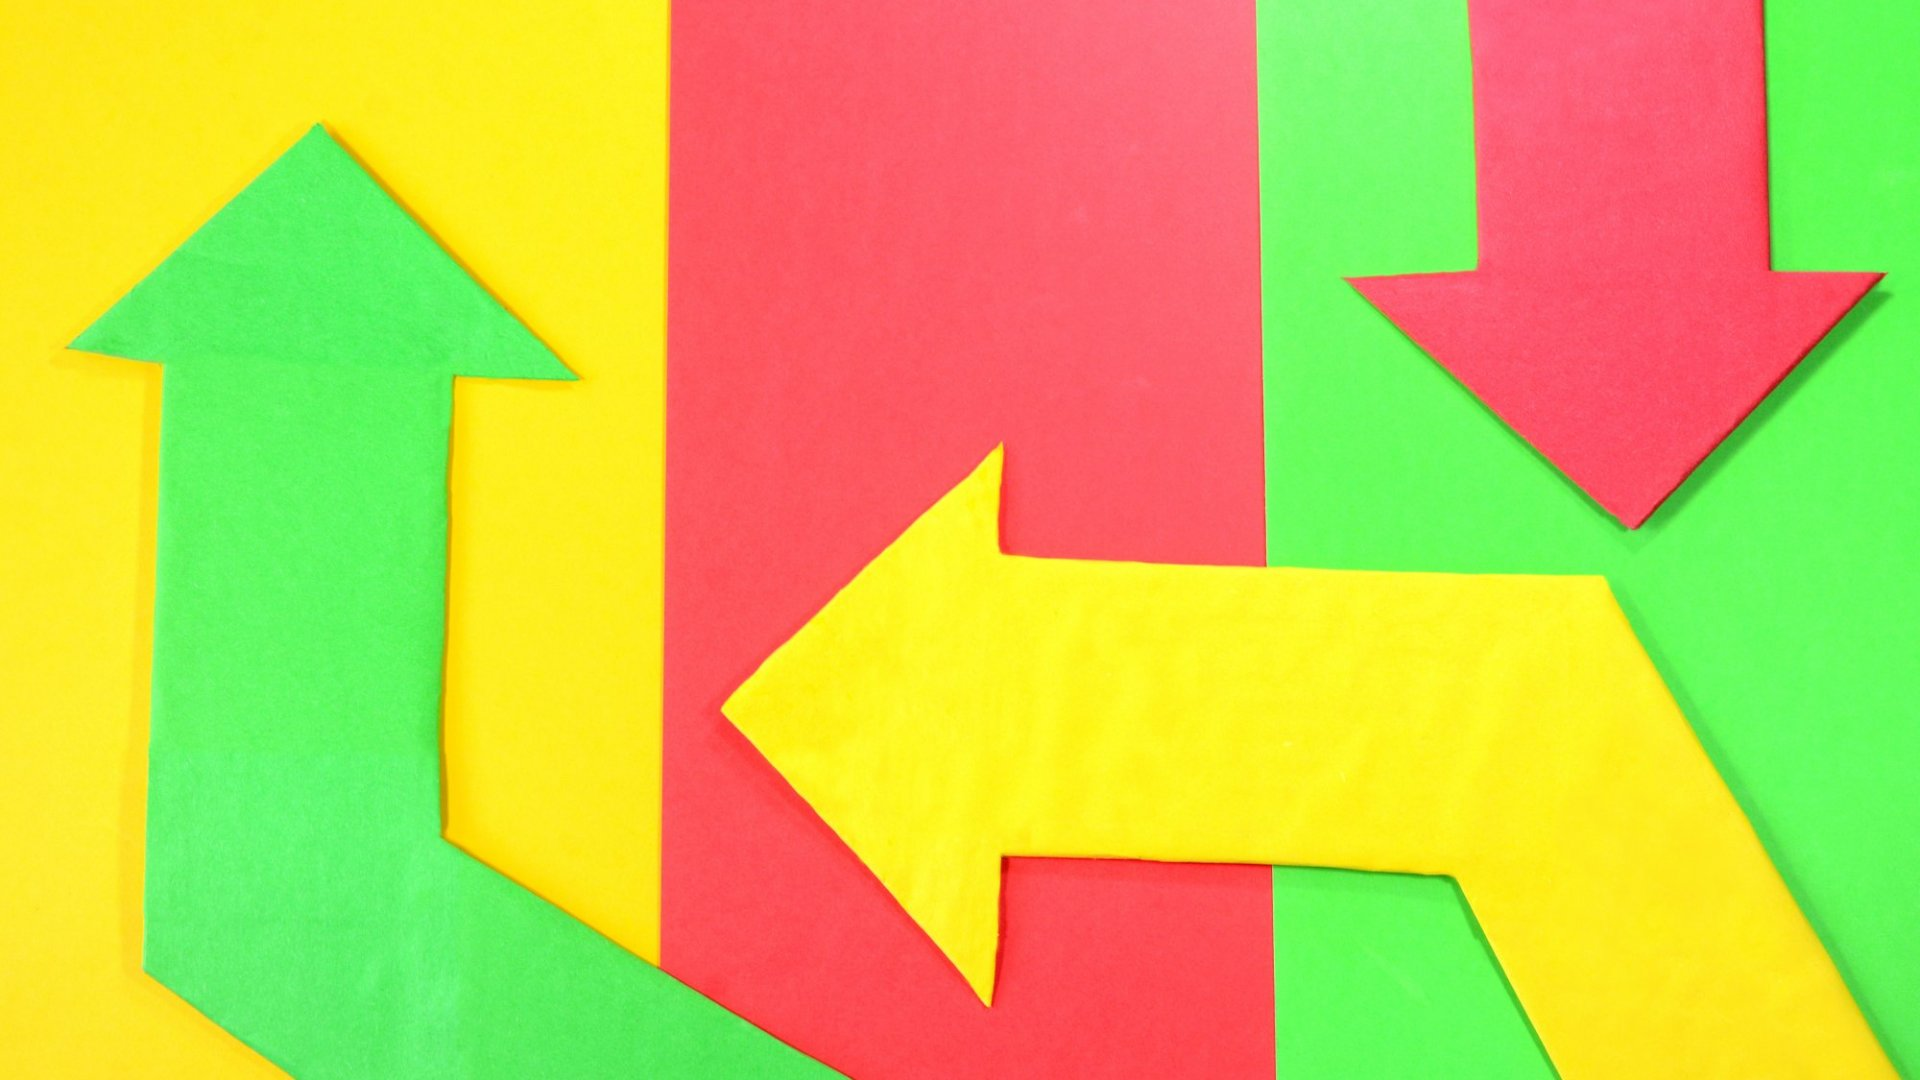 6 Ways to Develop Sharp Business Judgment